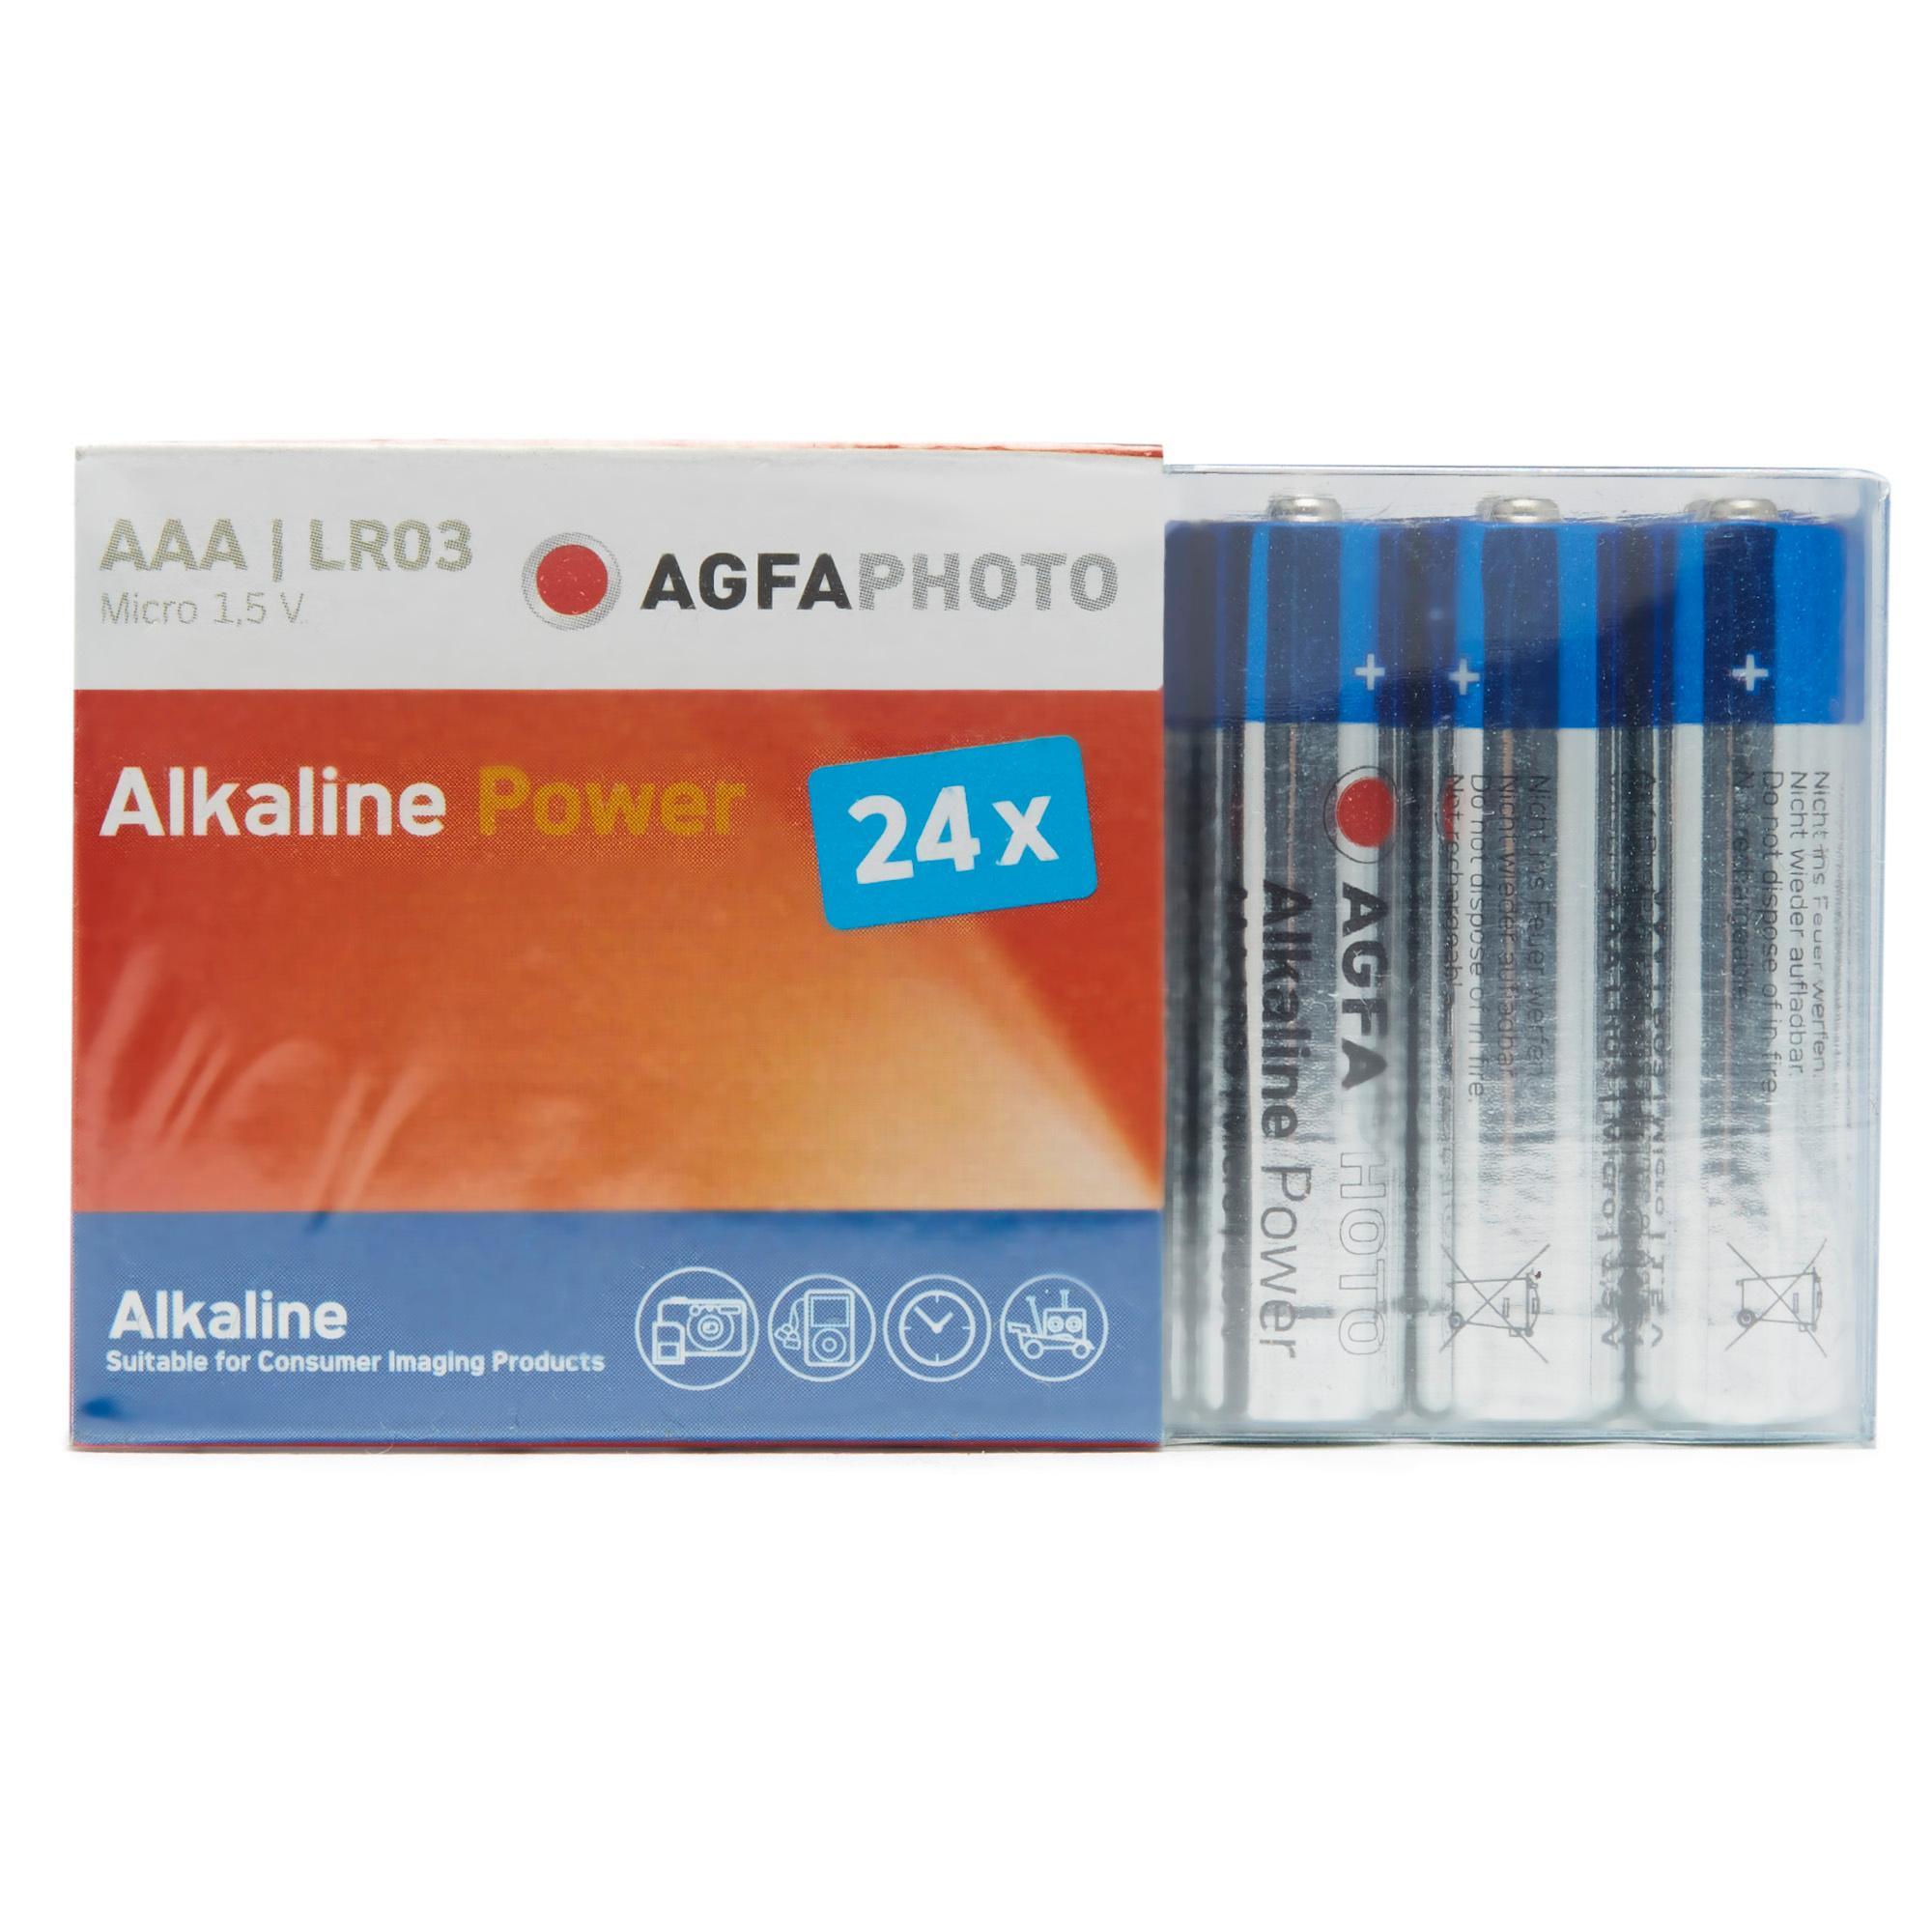 AGFA Alkaline Power AAA LR03 Batteries 24 Pack, SLIVER/BLUE